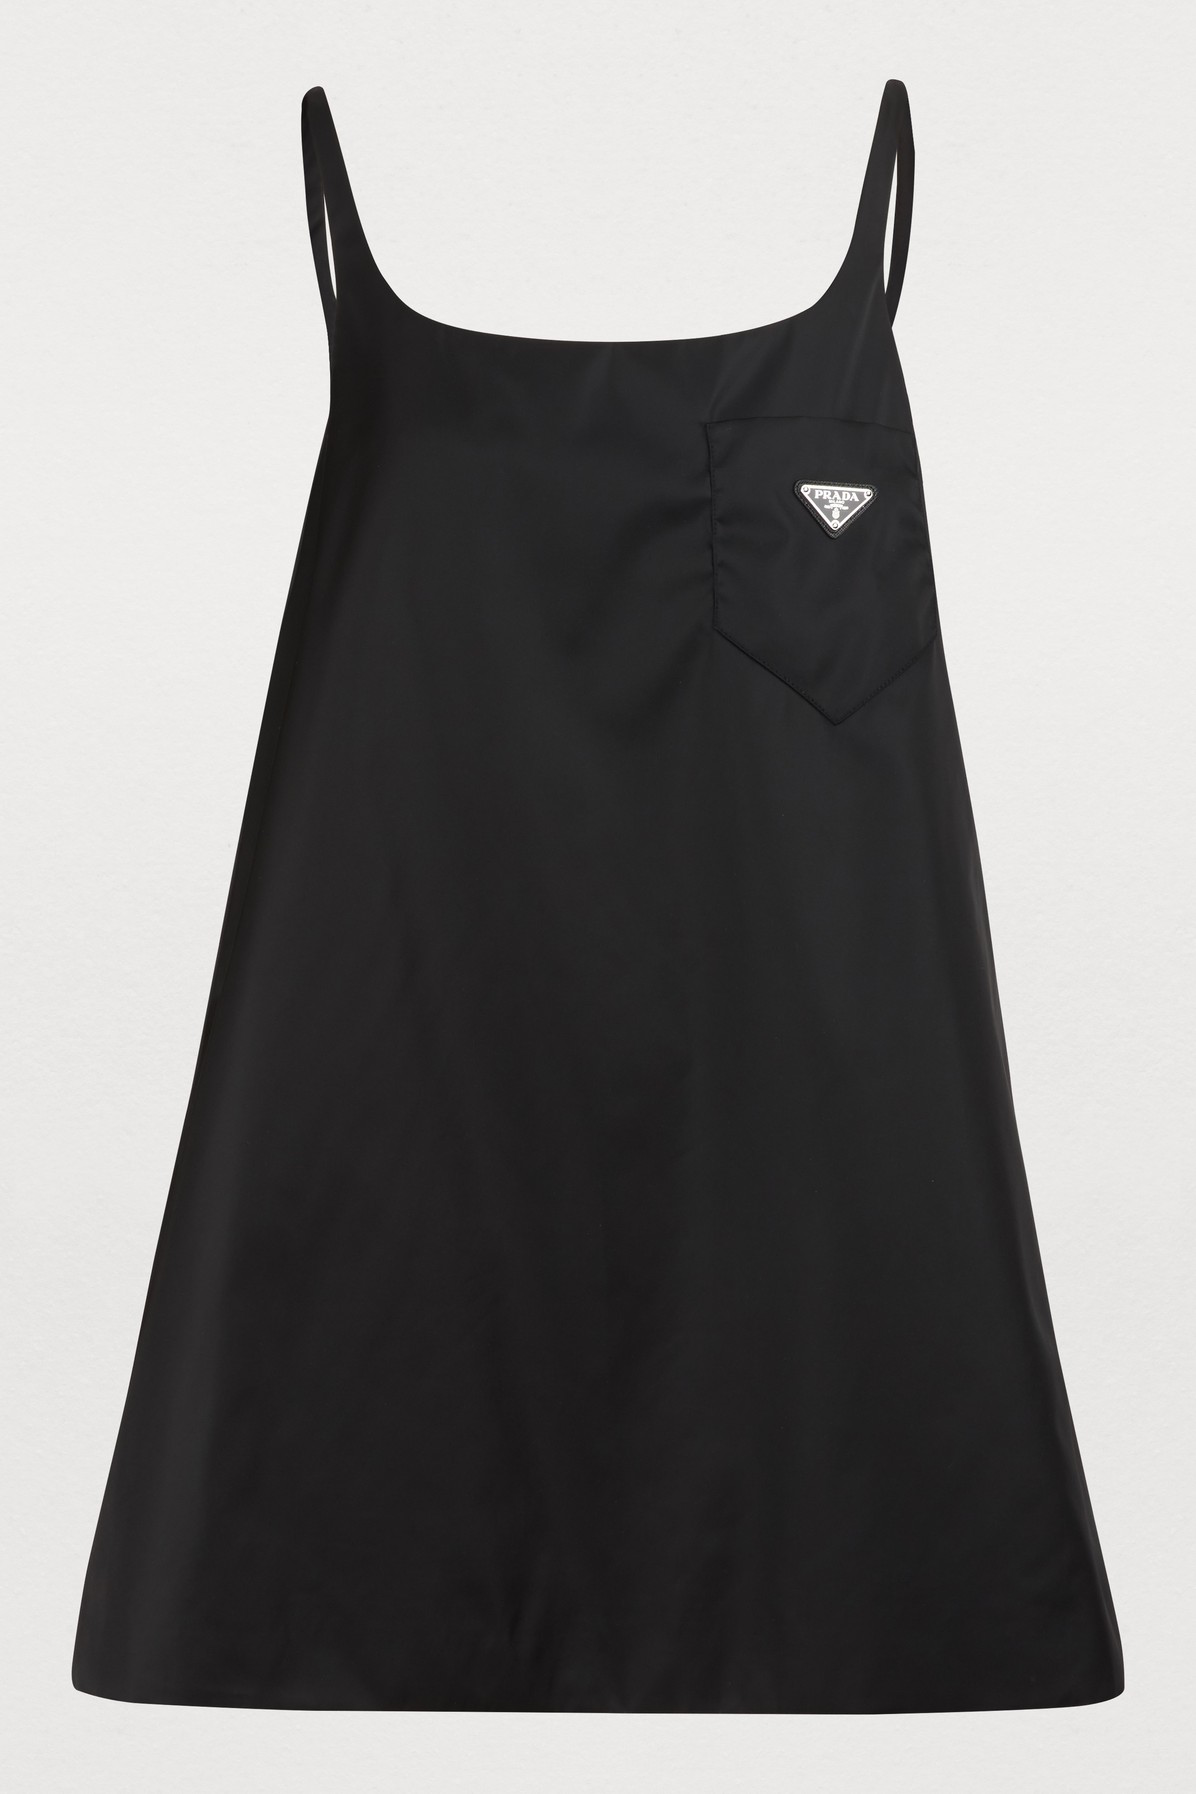 6e8652f2e74c Prada Patch-Pocket Technical-Satin Mini Dress In Black | ModeSens